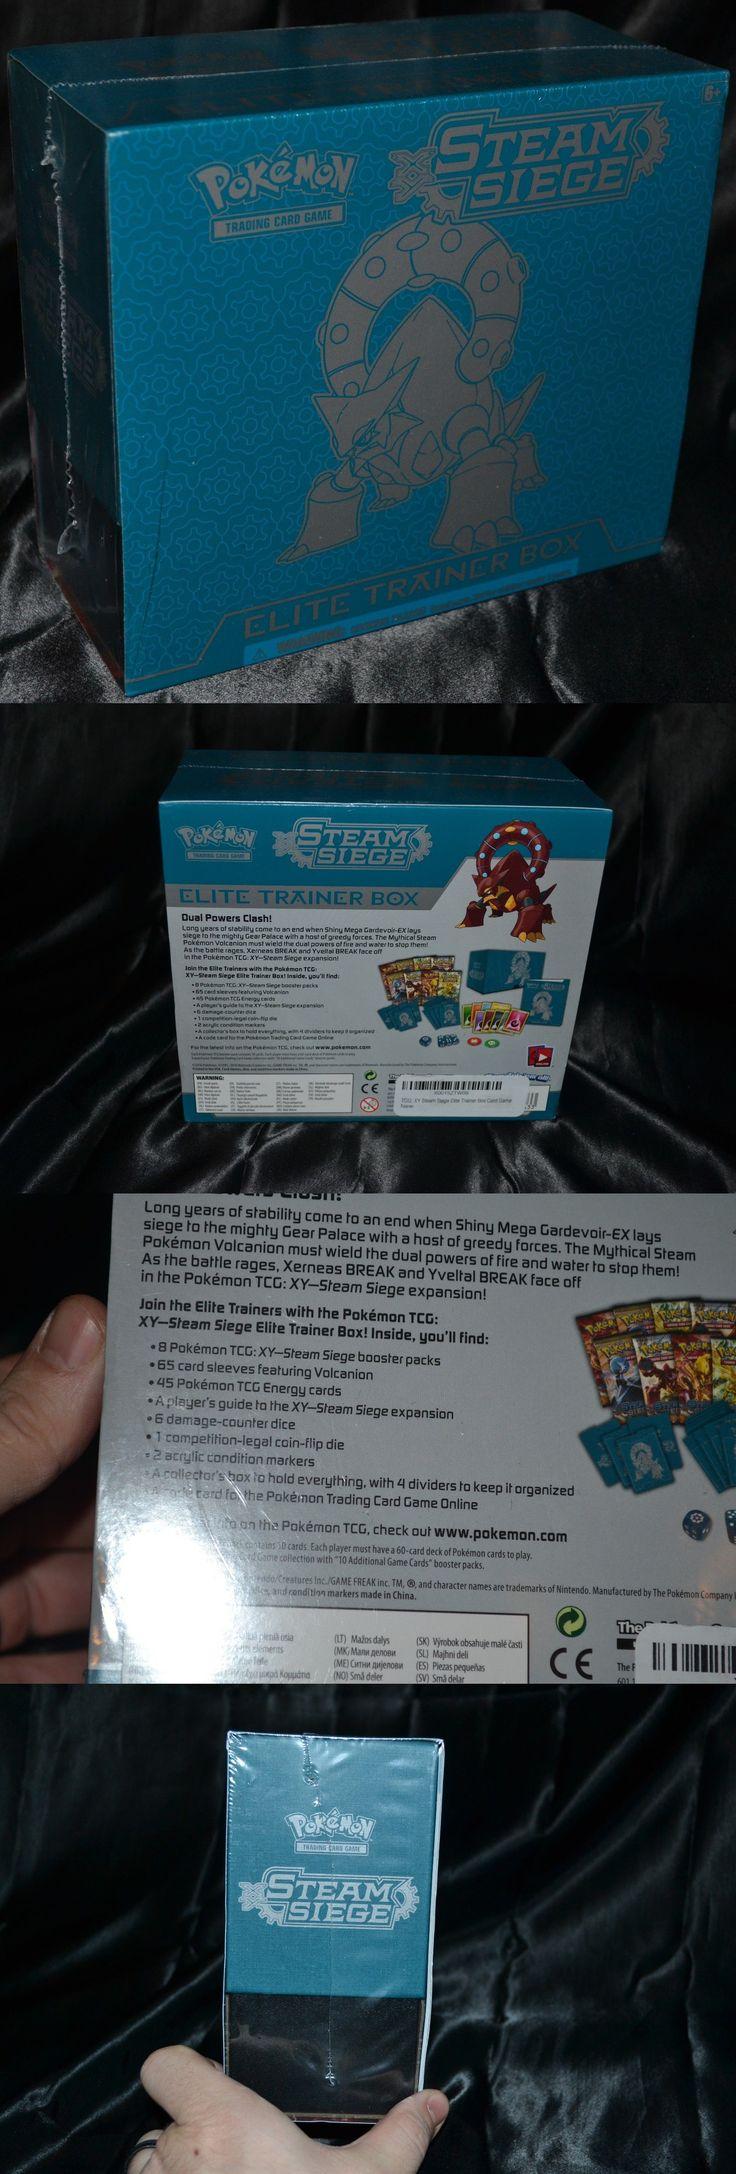 Pok mon Sealed Decks and Kits 183467: Volcanion Ex Elite Trainer Box Xy Steam Siege Set Pokemon Trading Cards Tcg Game -> BUY IT NOW ONLY: $84.74 on eBay!